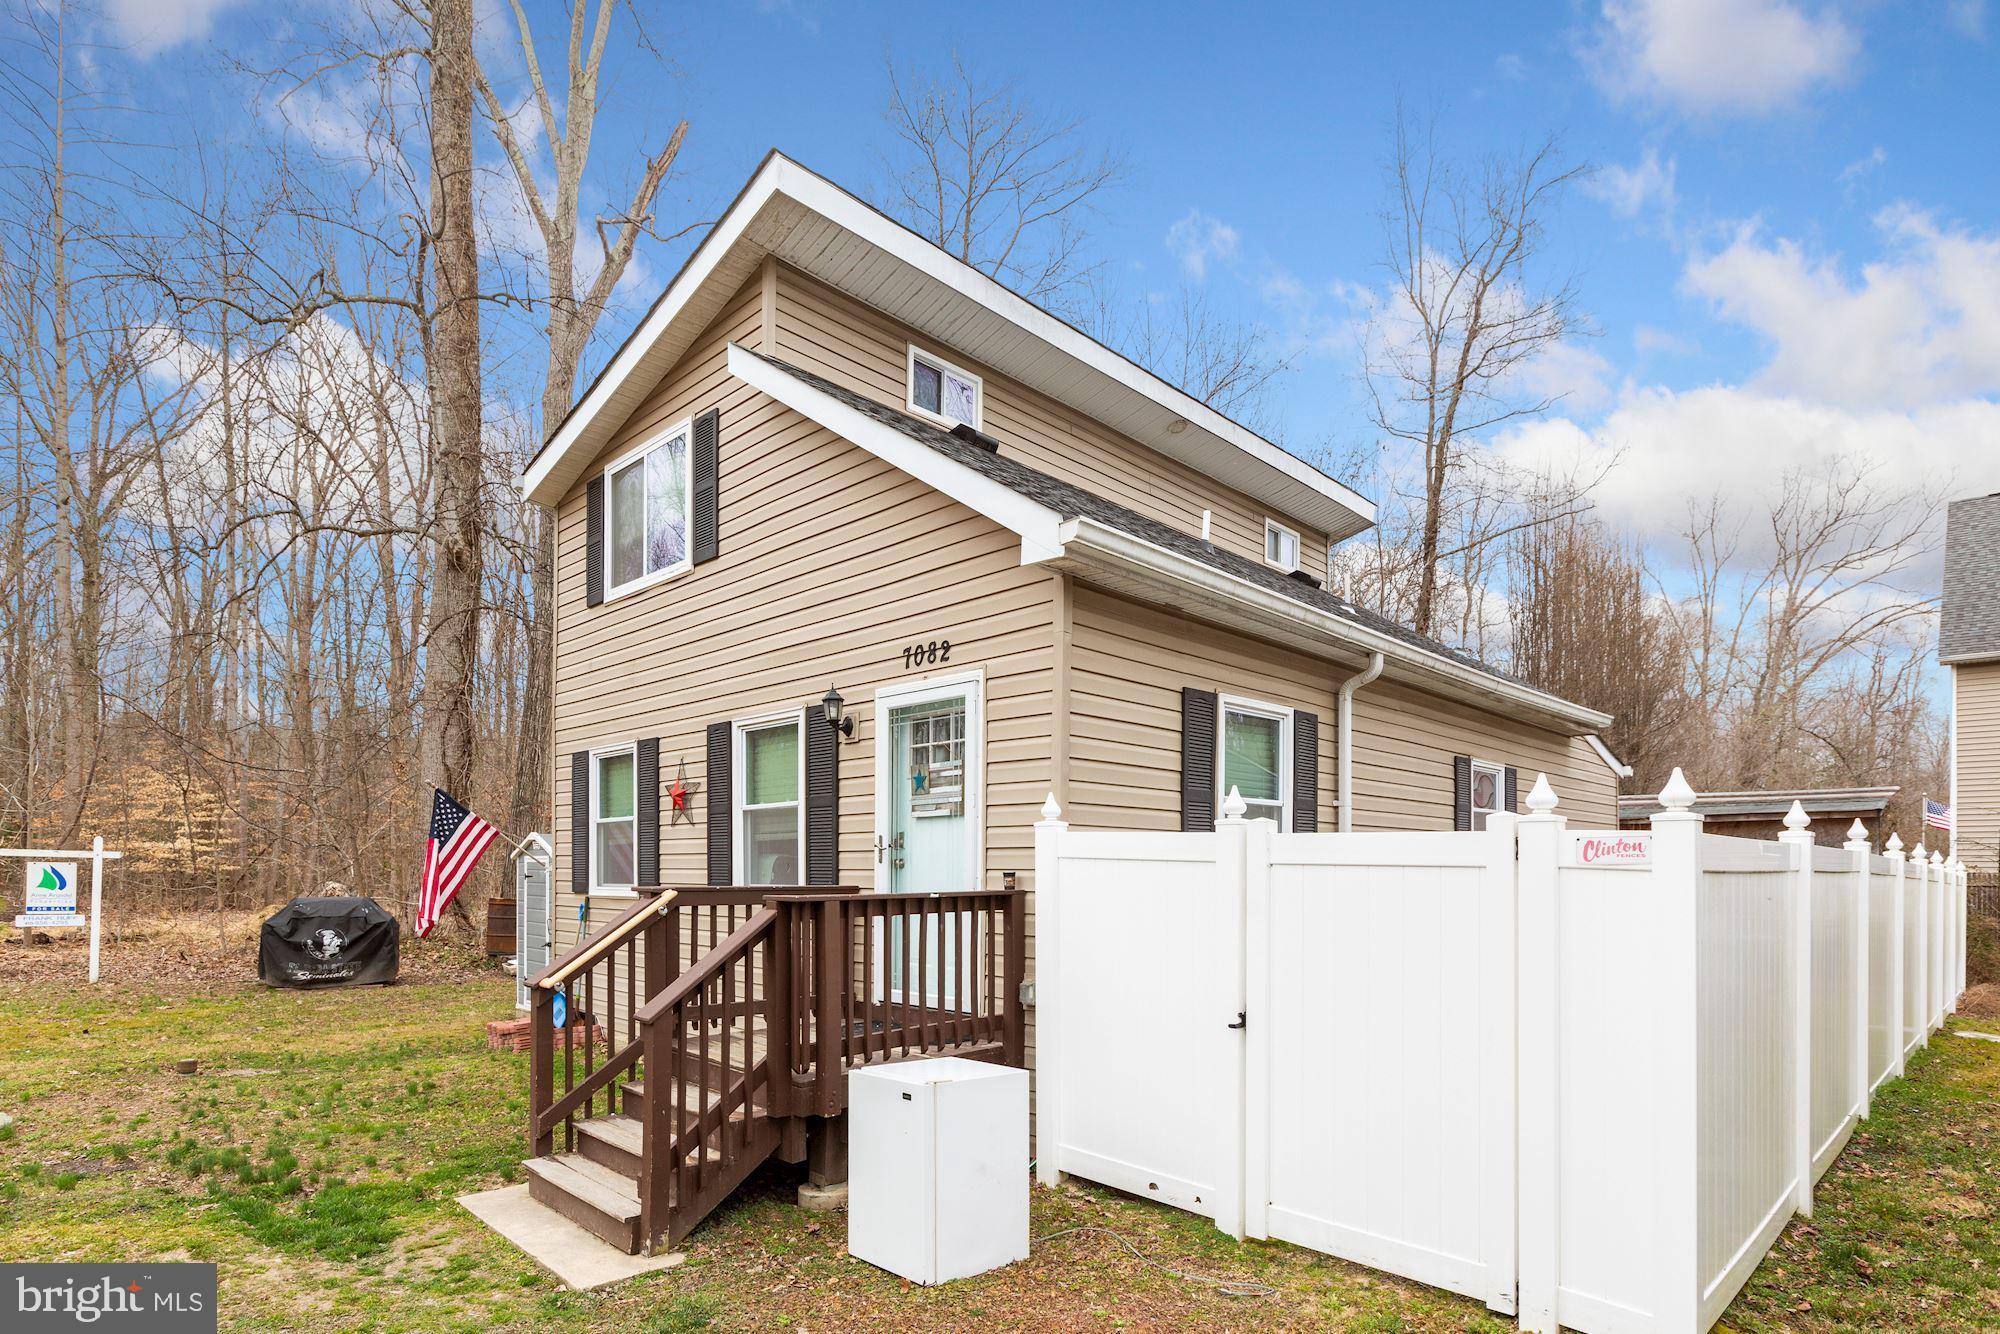 7082 MYRTLE AVENUE, NORTH BEACH, Maryland 20714, 3 Bedrooms Bedrooms, ,3 BathroomsBathrooms,Single Family,For Sale,7082 MYRTLE AVENUE,MDAA461352